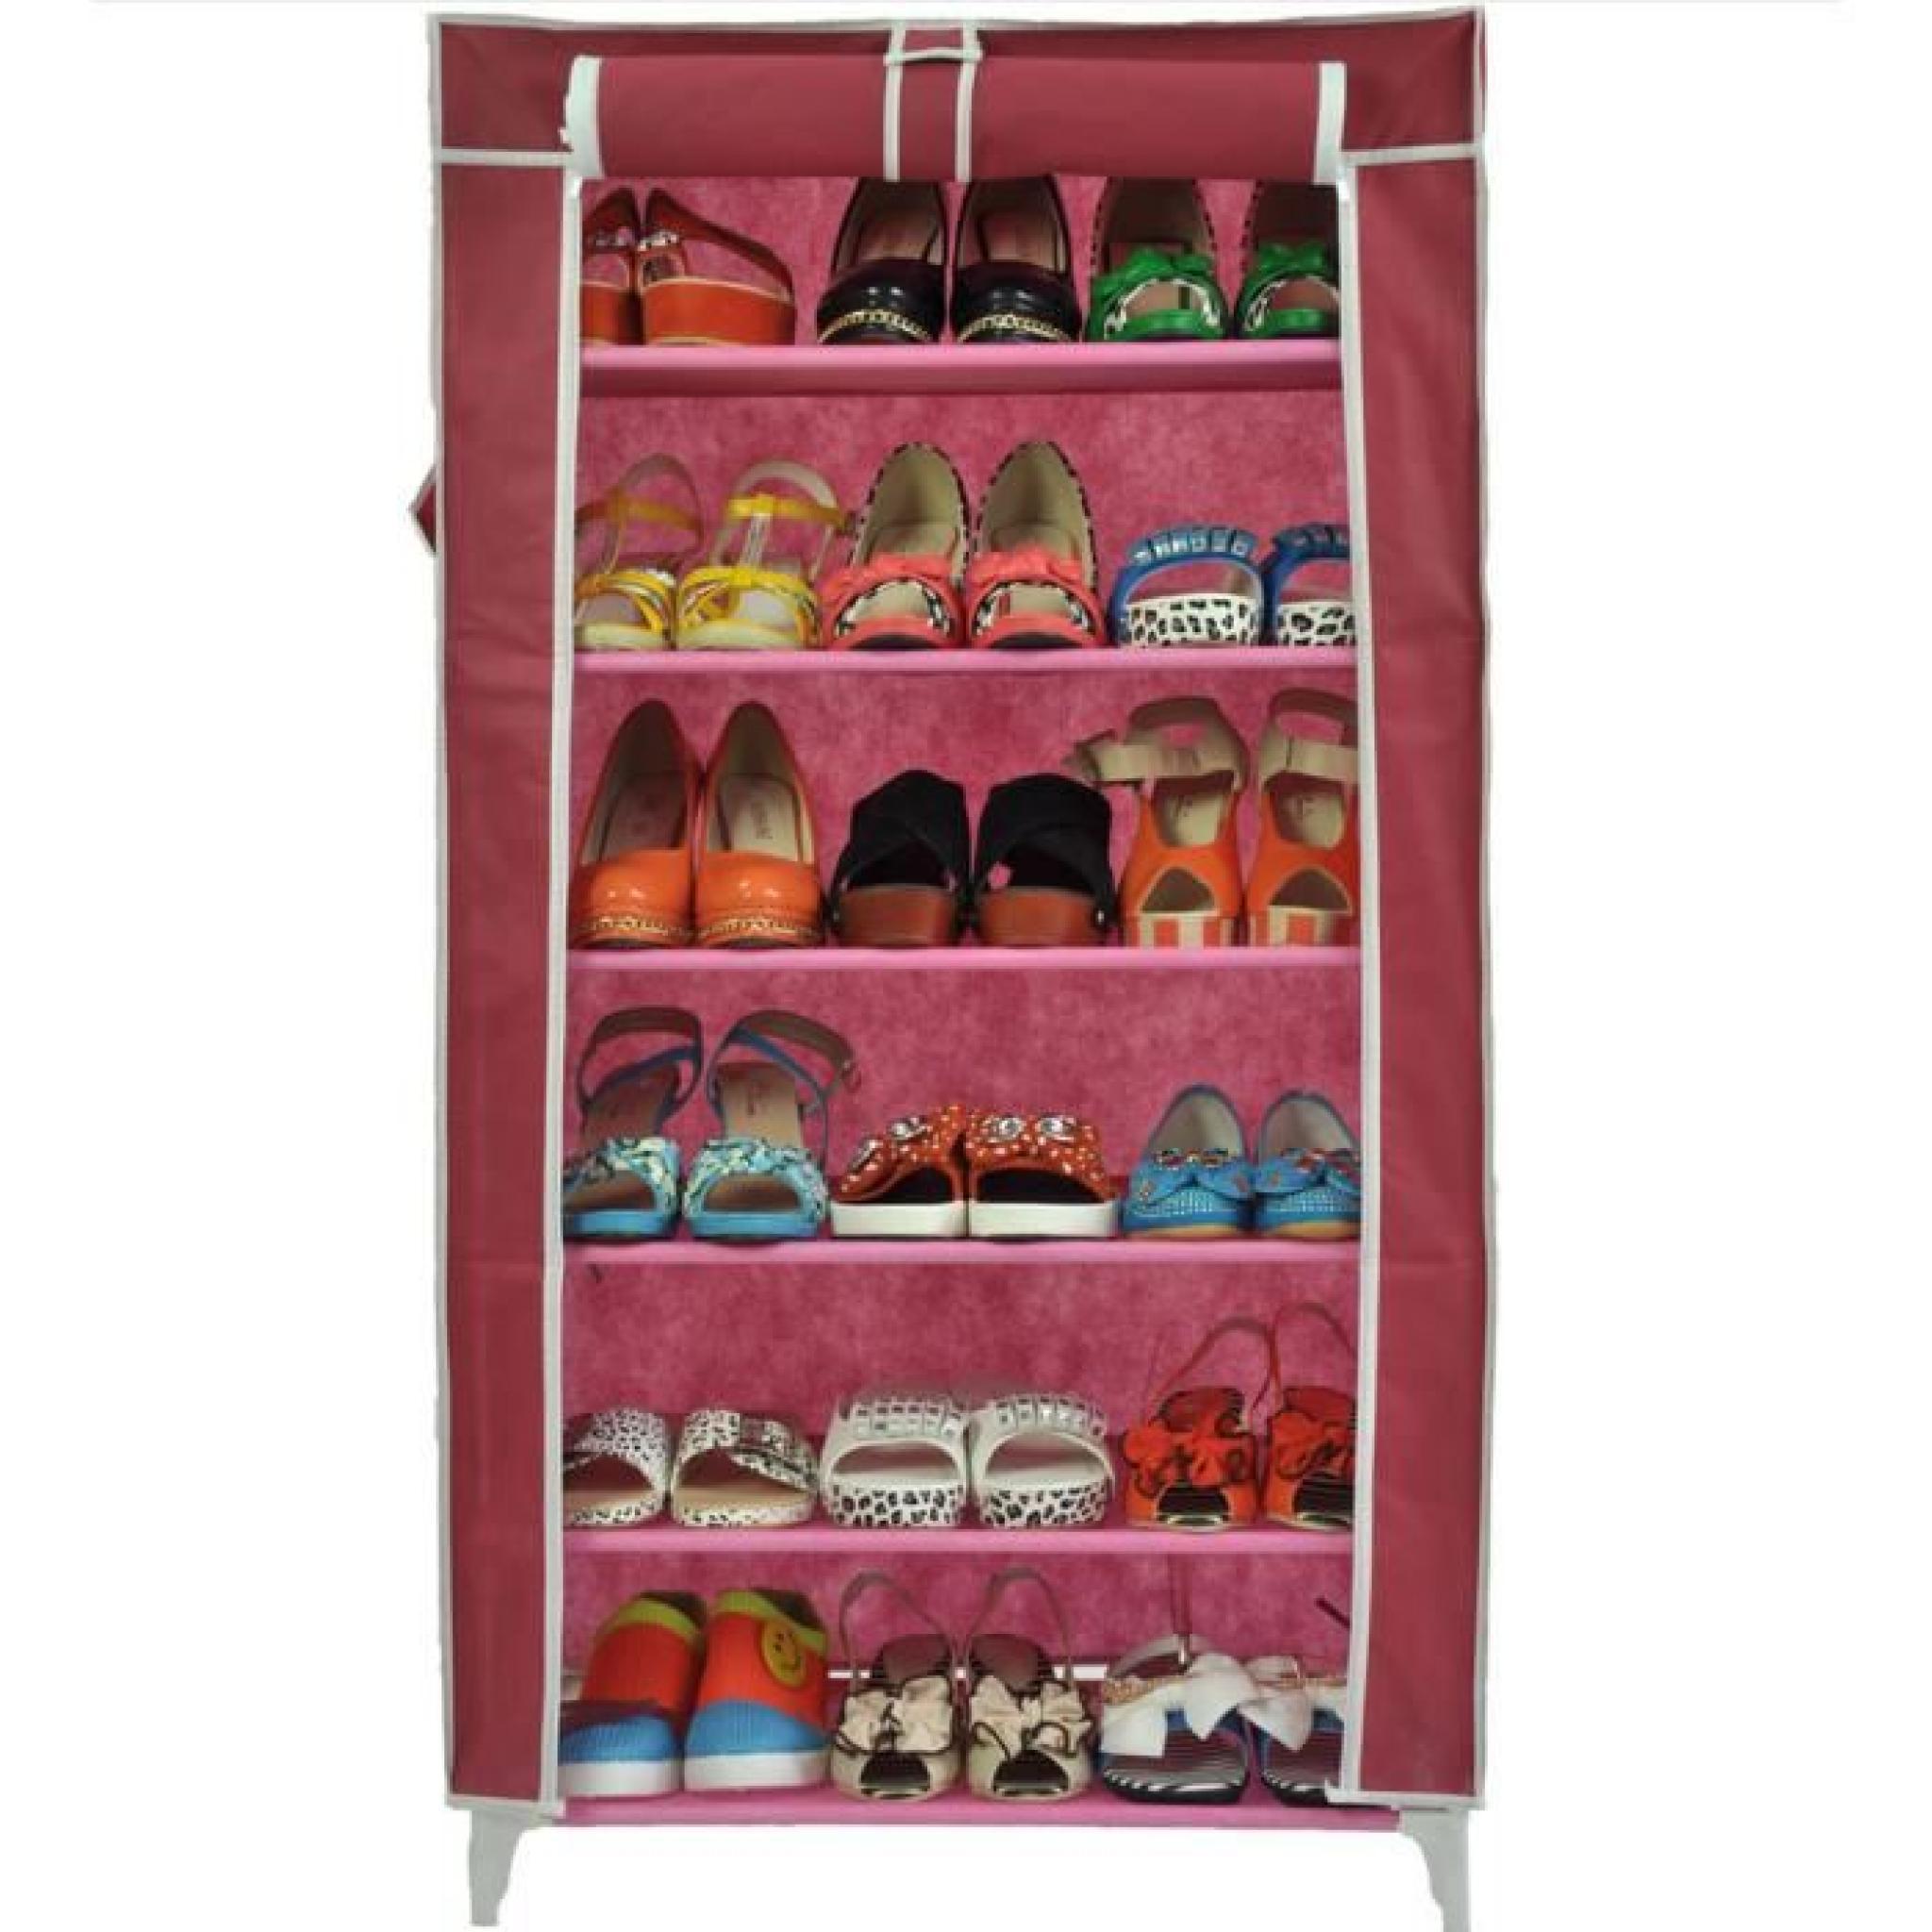 Meuble Penderie Garde Robe Etagere pour chaussures Vetements 58 x 28 x 107 cm Rose